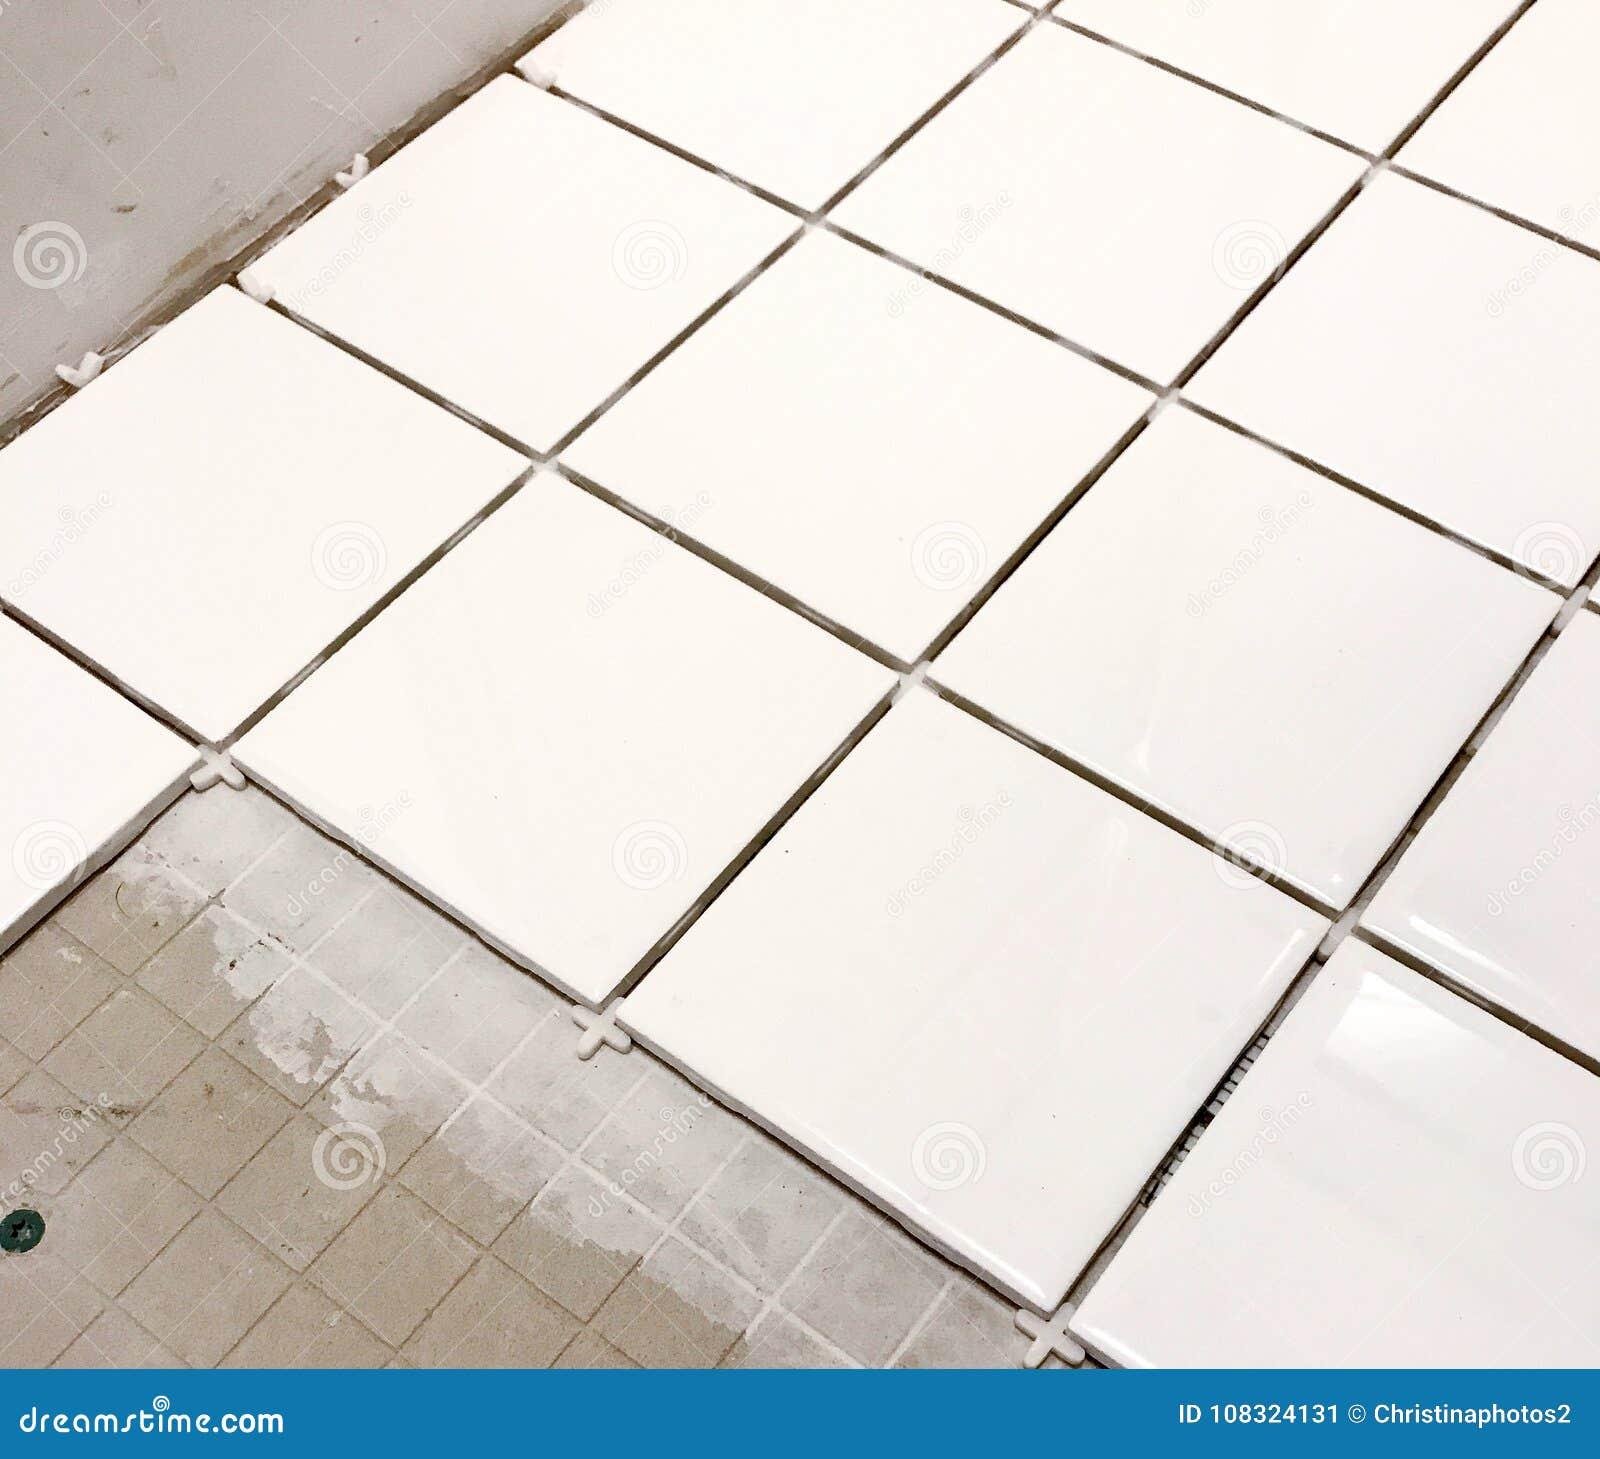 White Floor Tile Installation Stock Image Image Of Tile Square